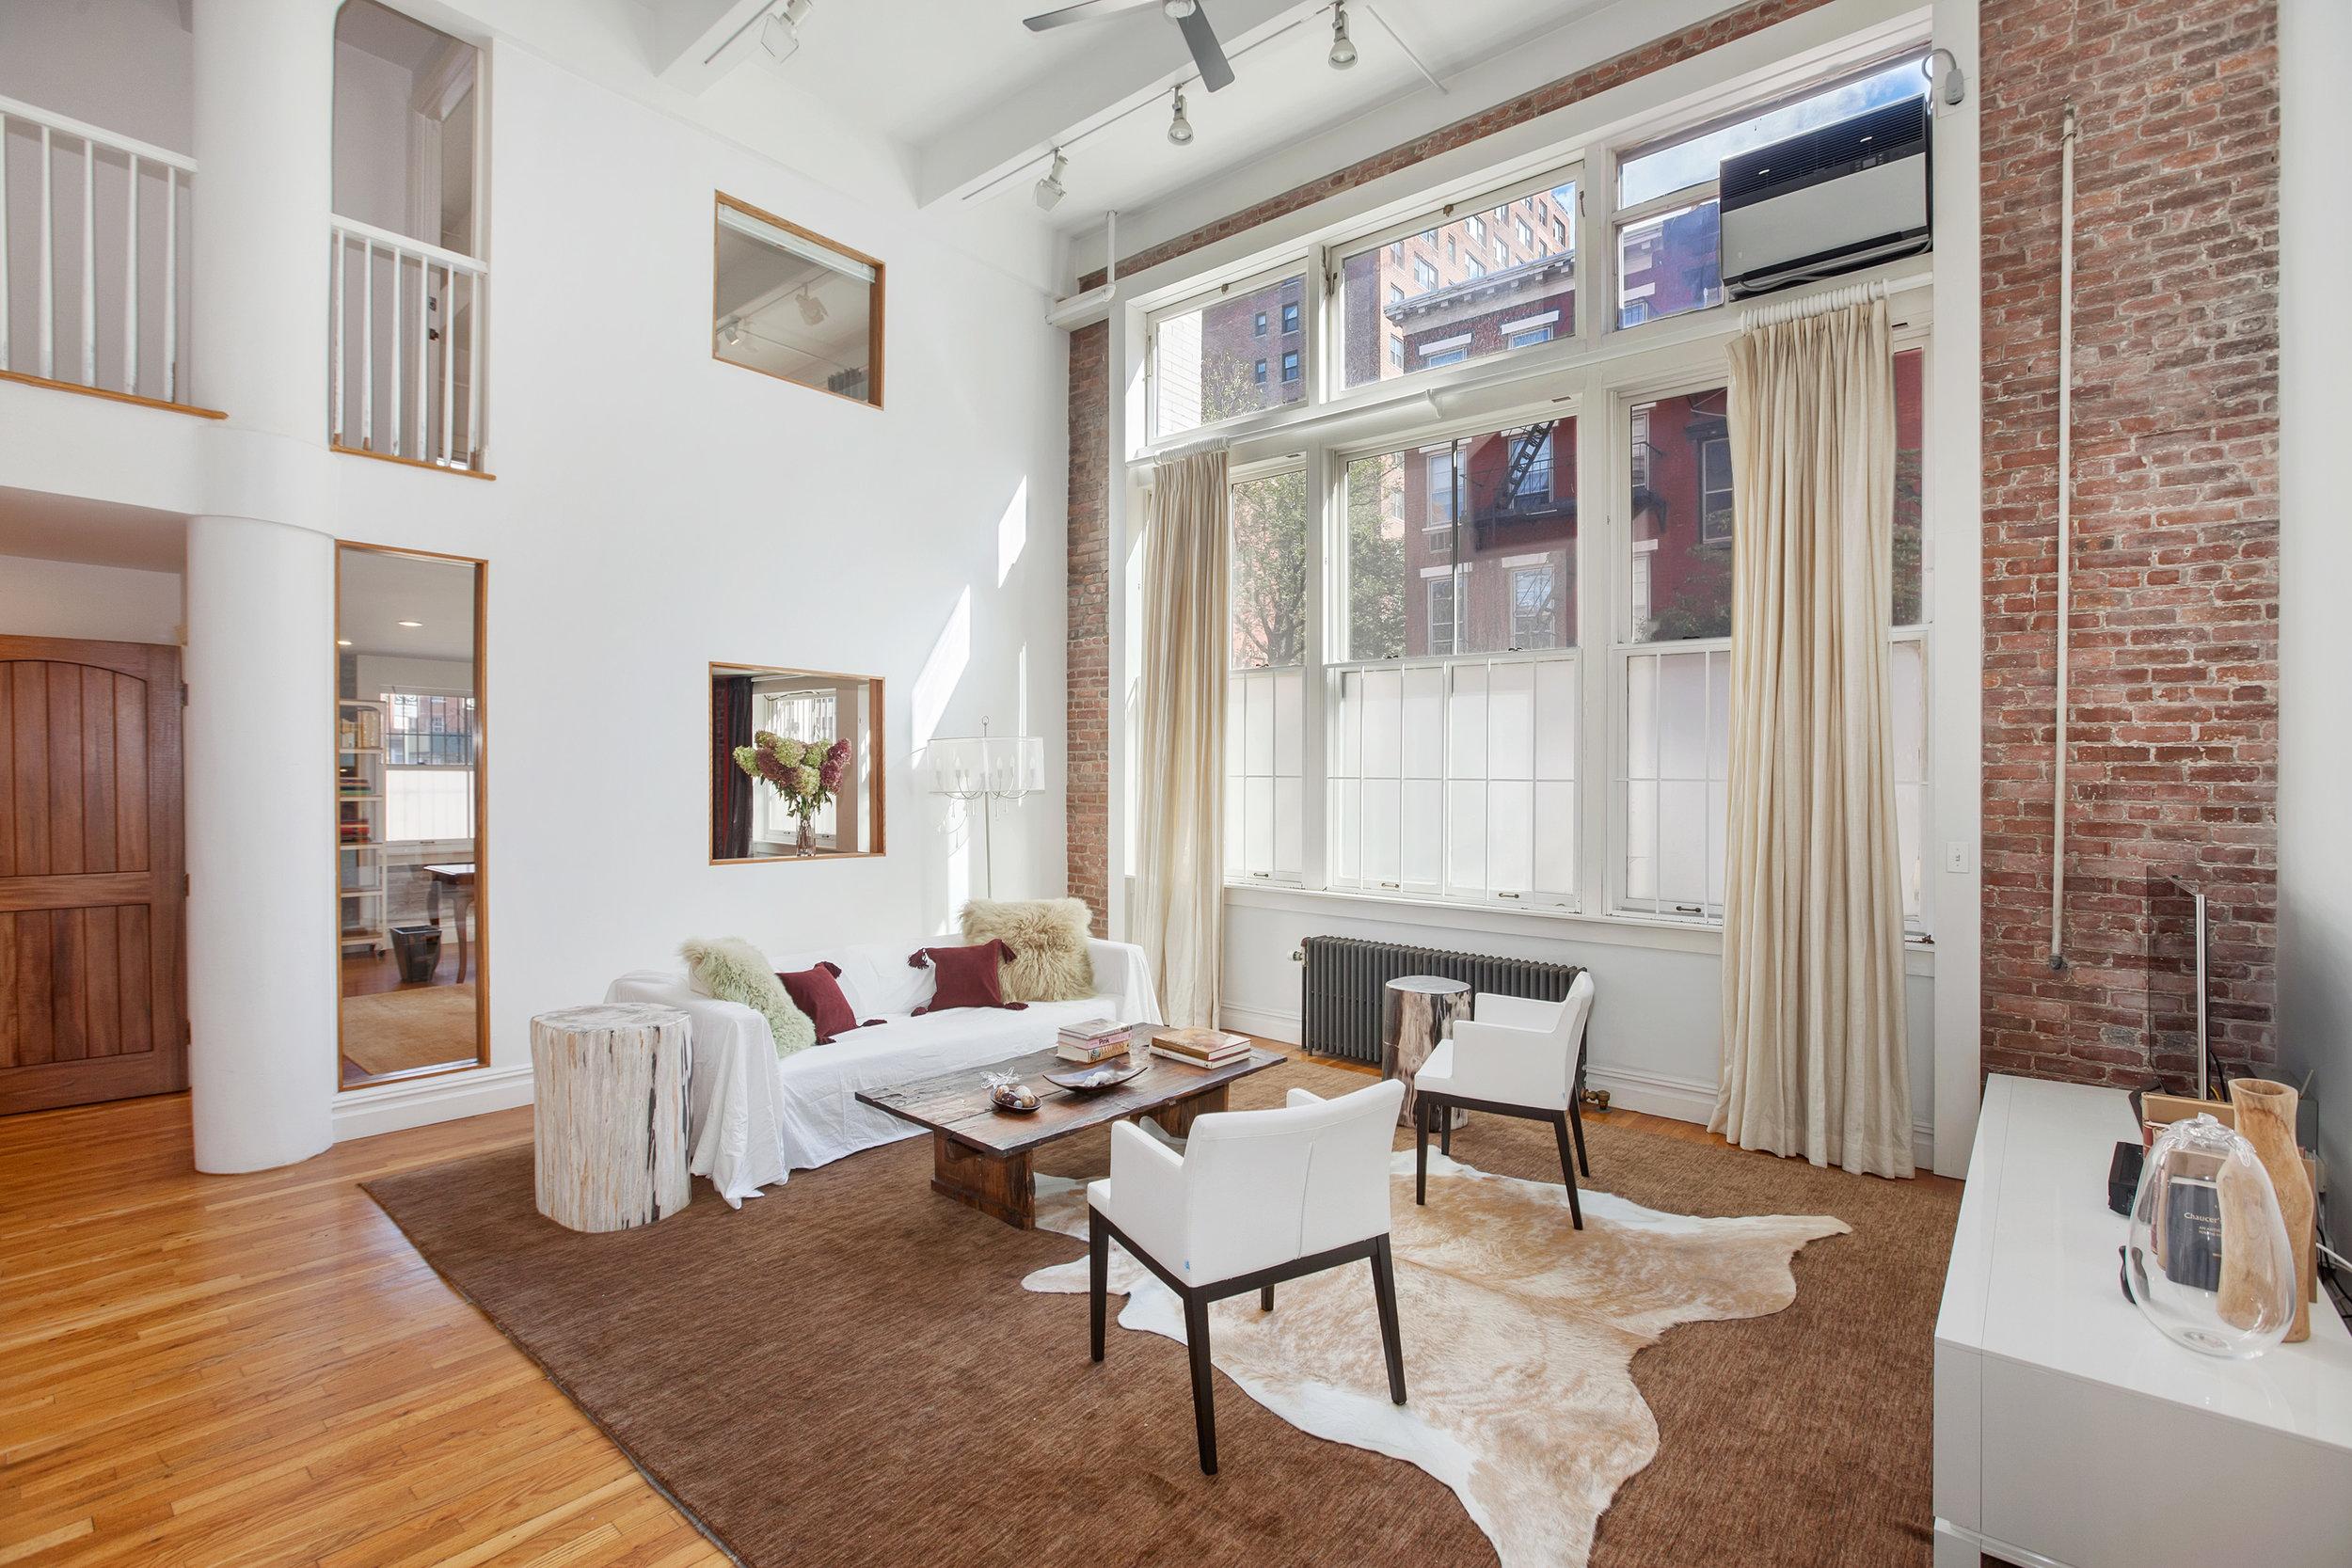 68 Jane Street, #1E - $3,995,000